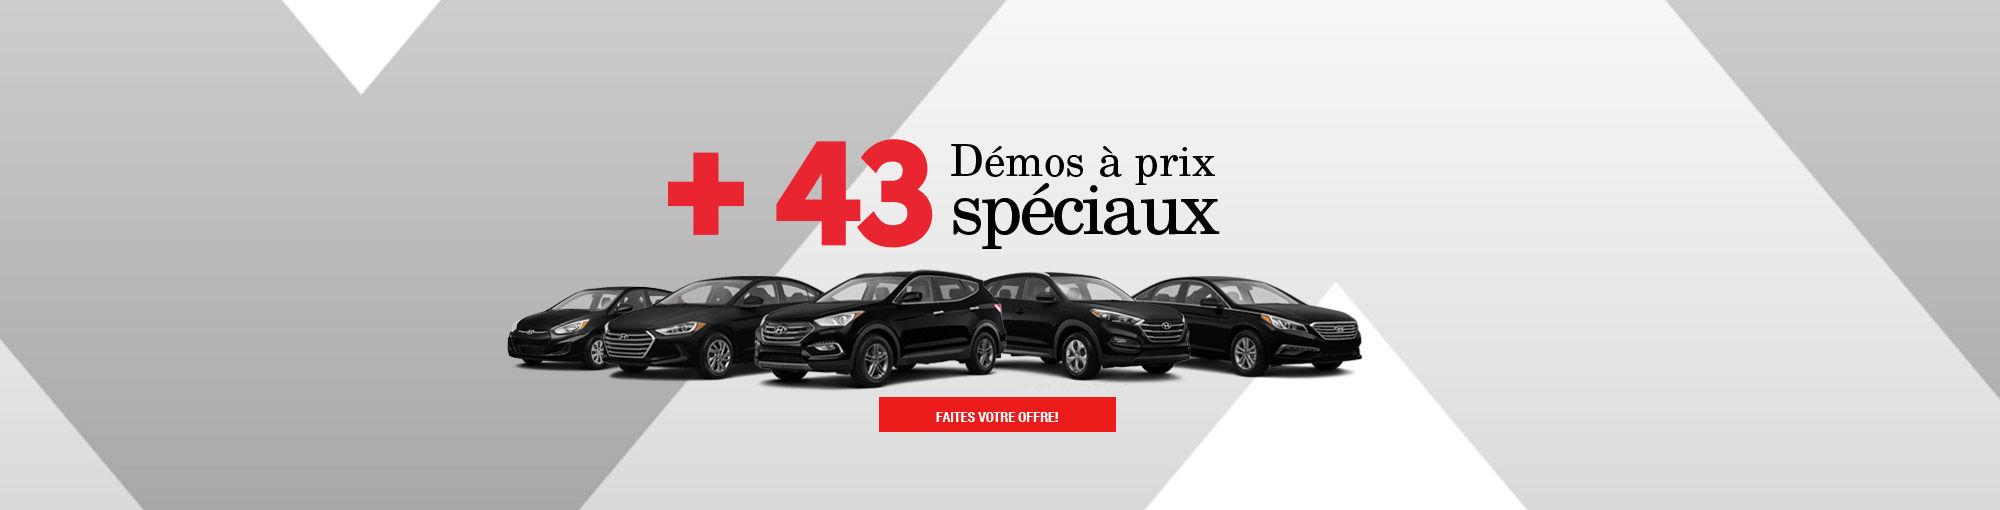 Liquidation FOU 2017 Hyundai Trois-Rivières Shawinigan 2017 #3